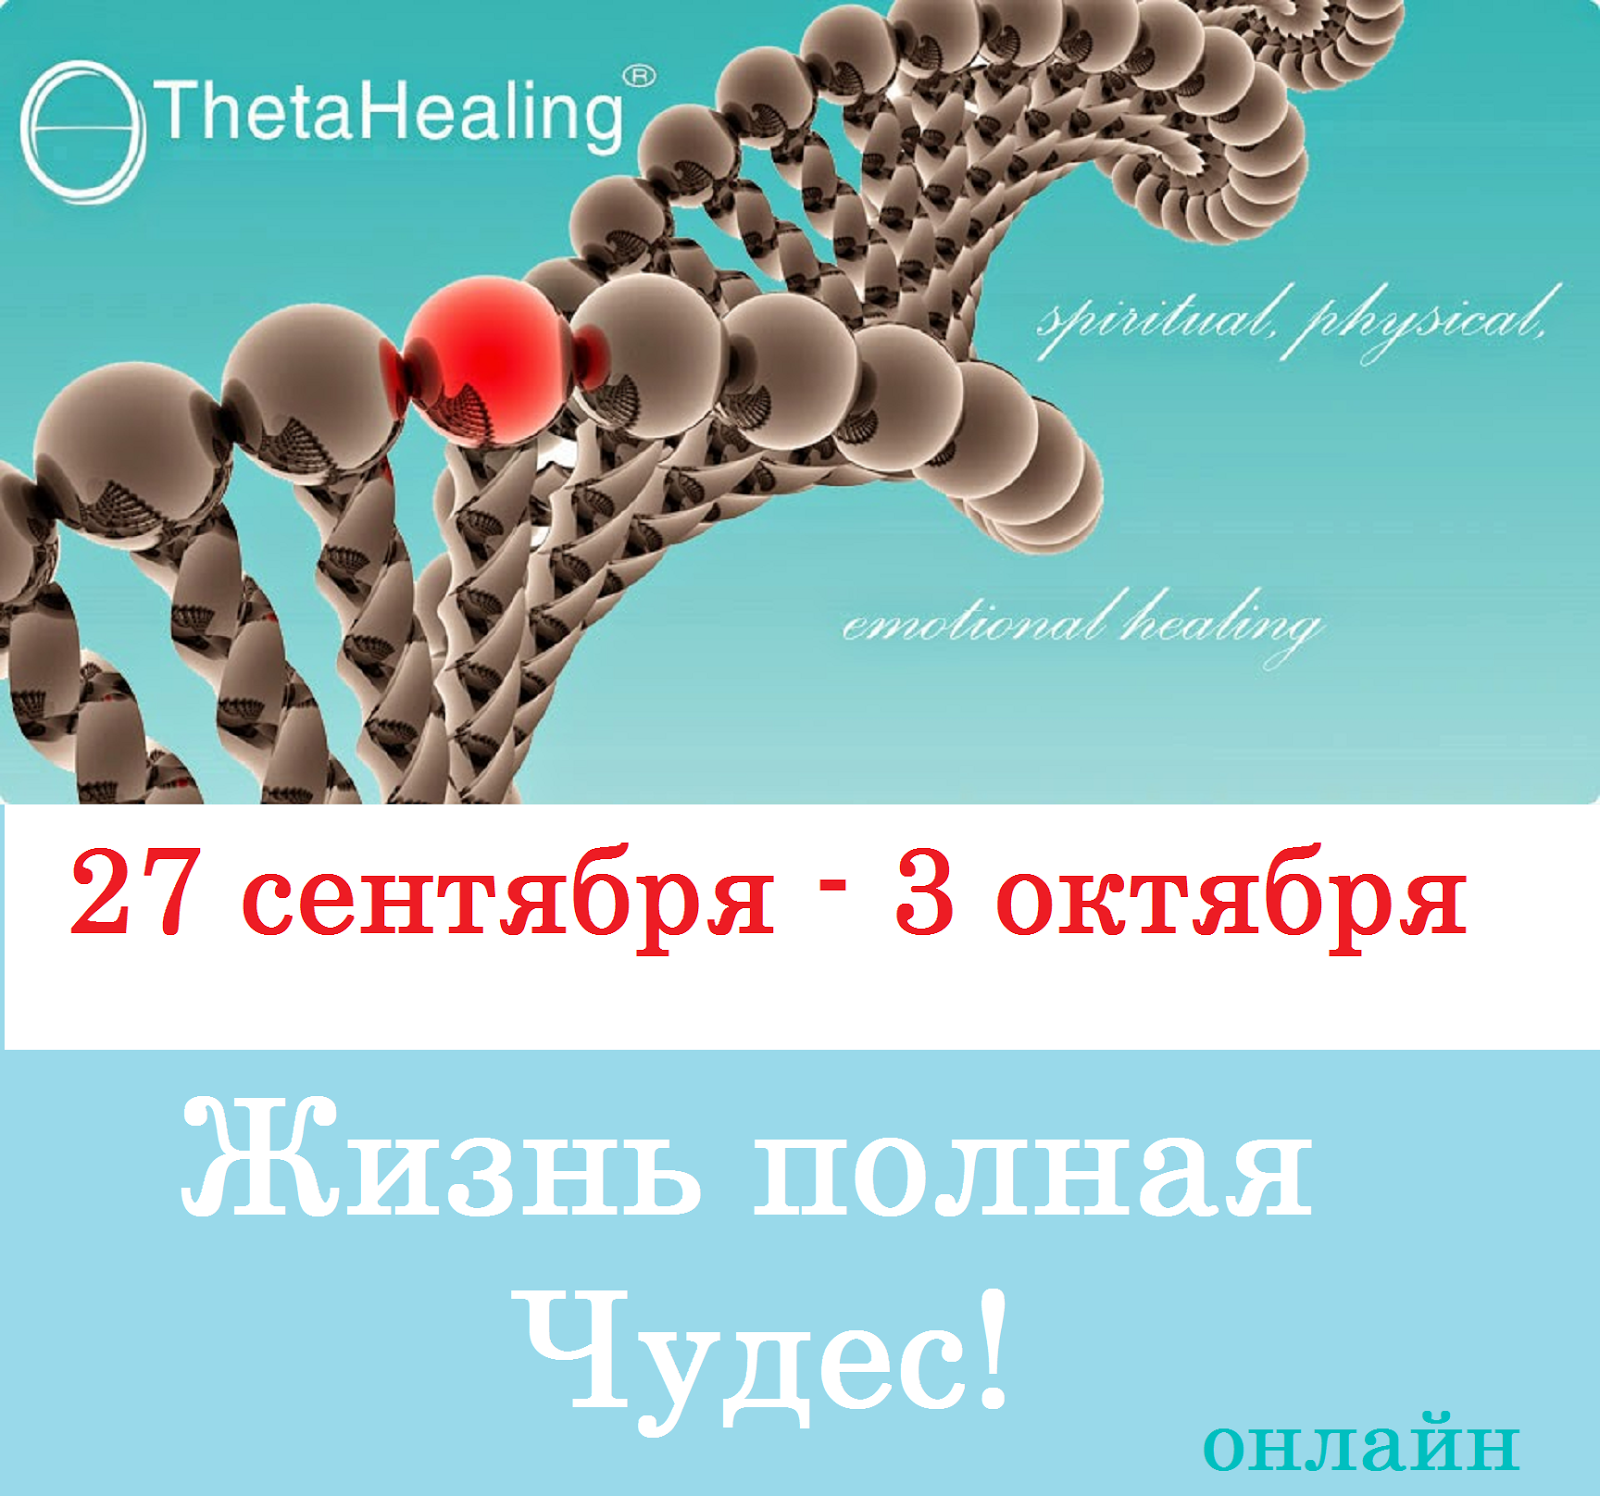 http://thetachudesa.blogspot.com/